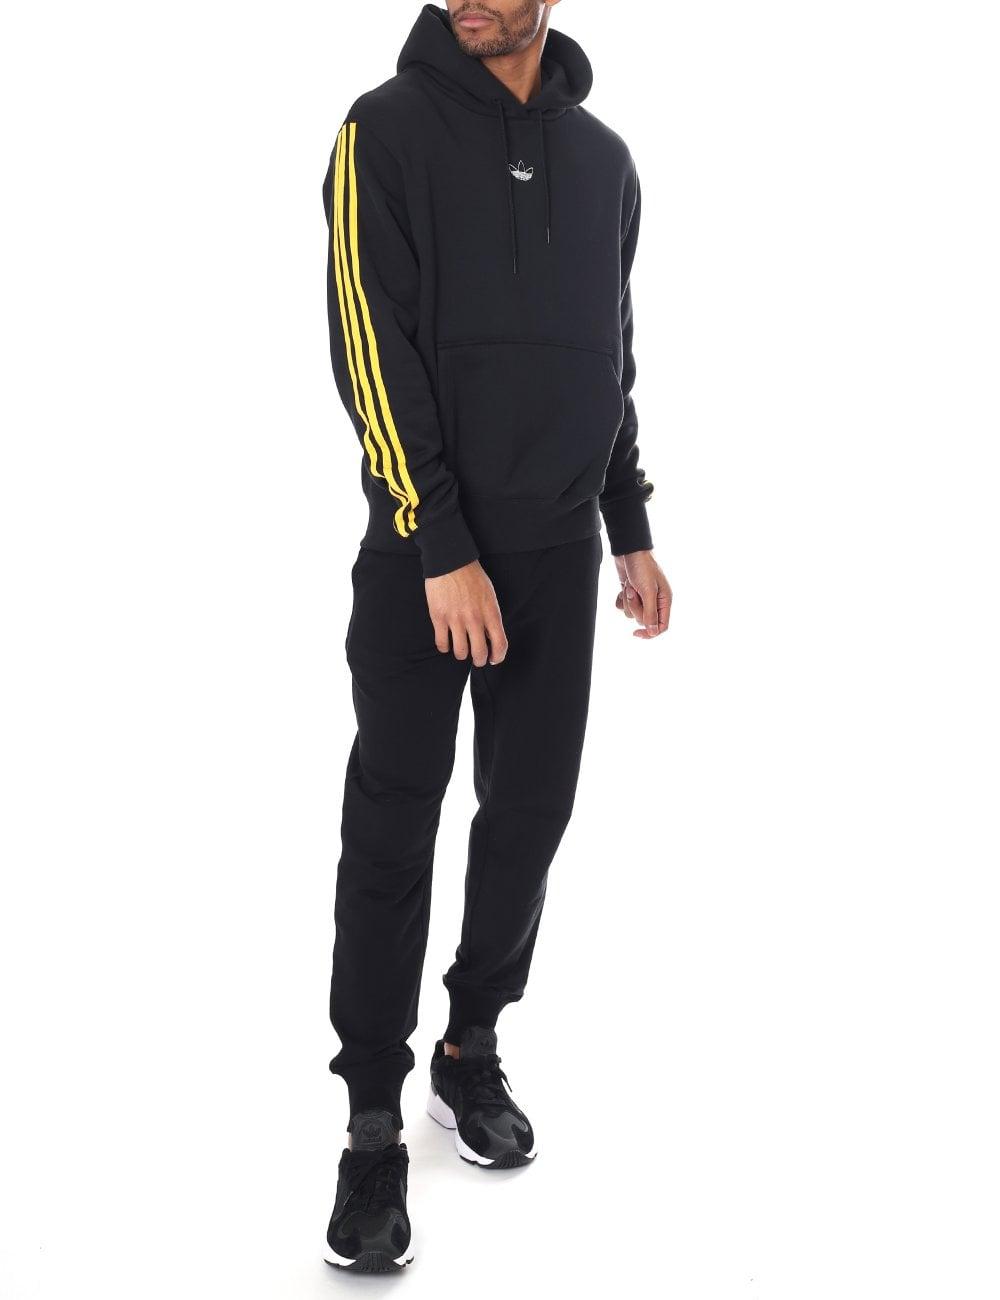 06a195825cd1 Adidas Men s B-Ball Hoodie